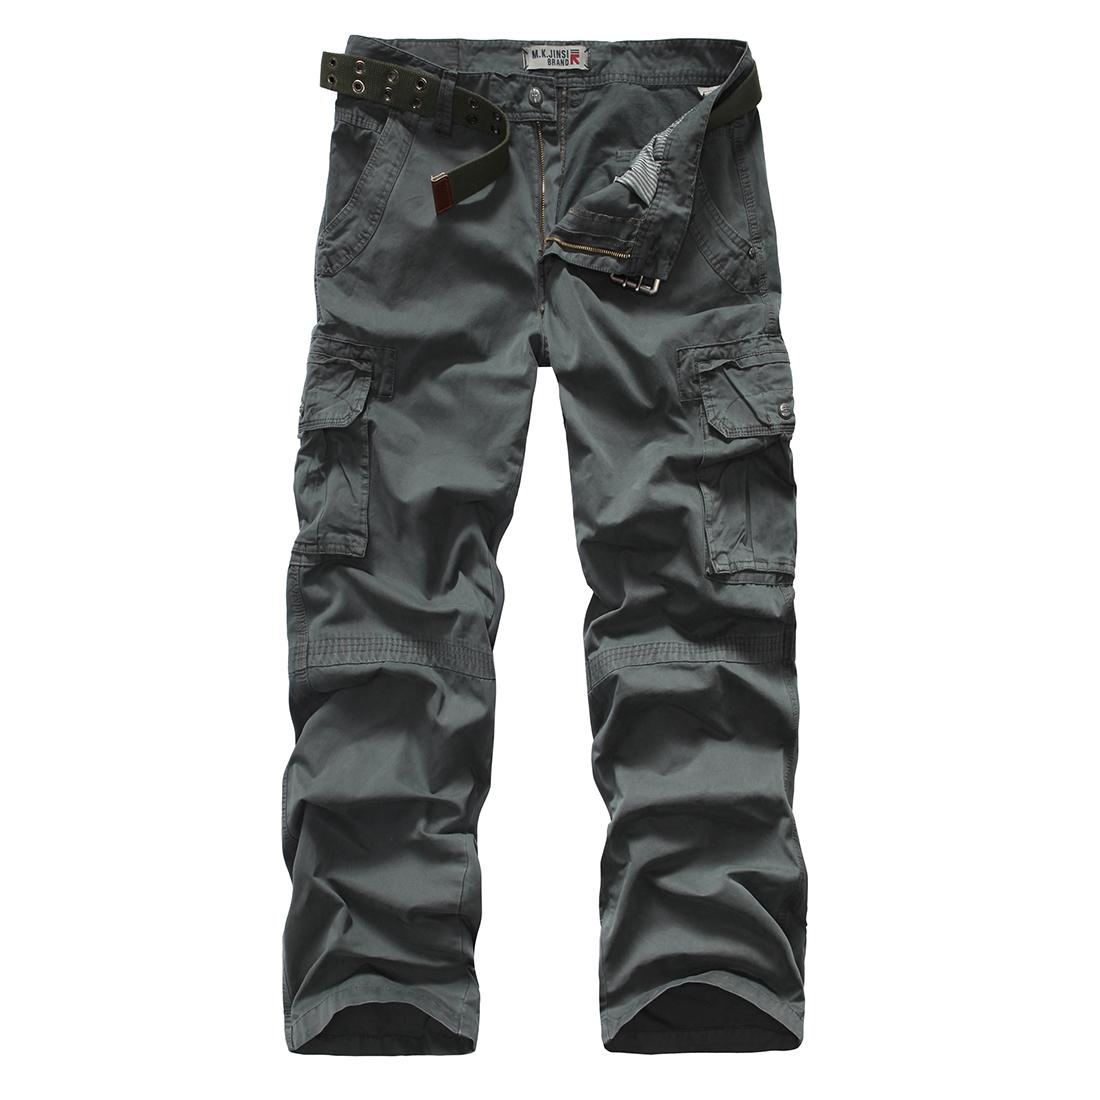 name brand cargo pants - Pi Pants